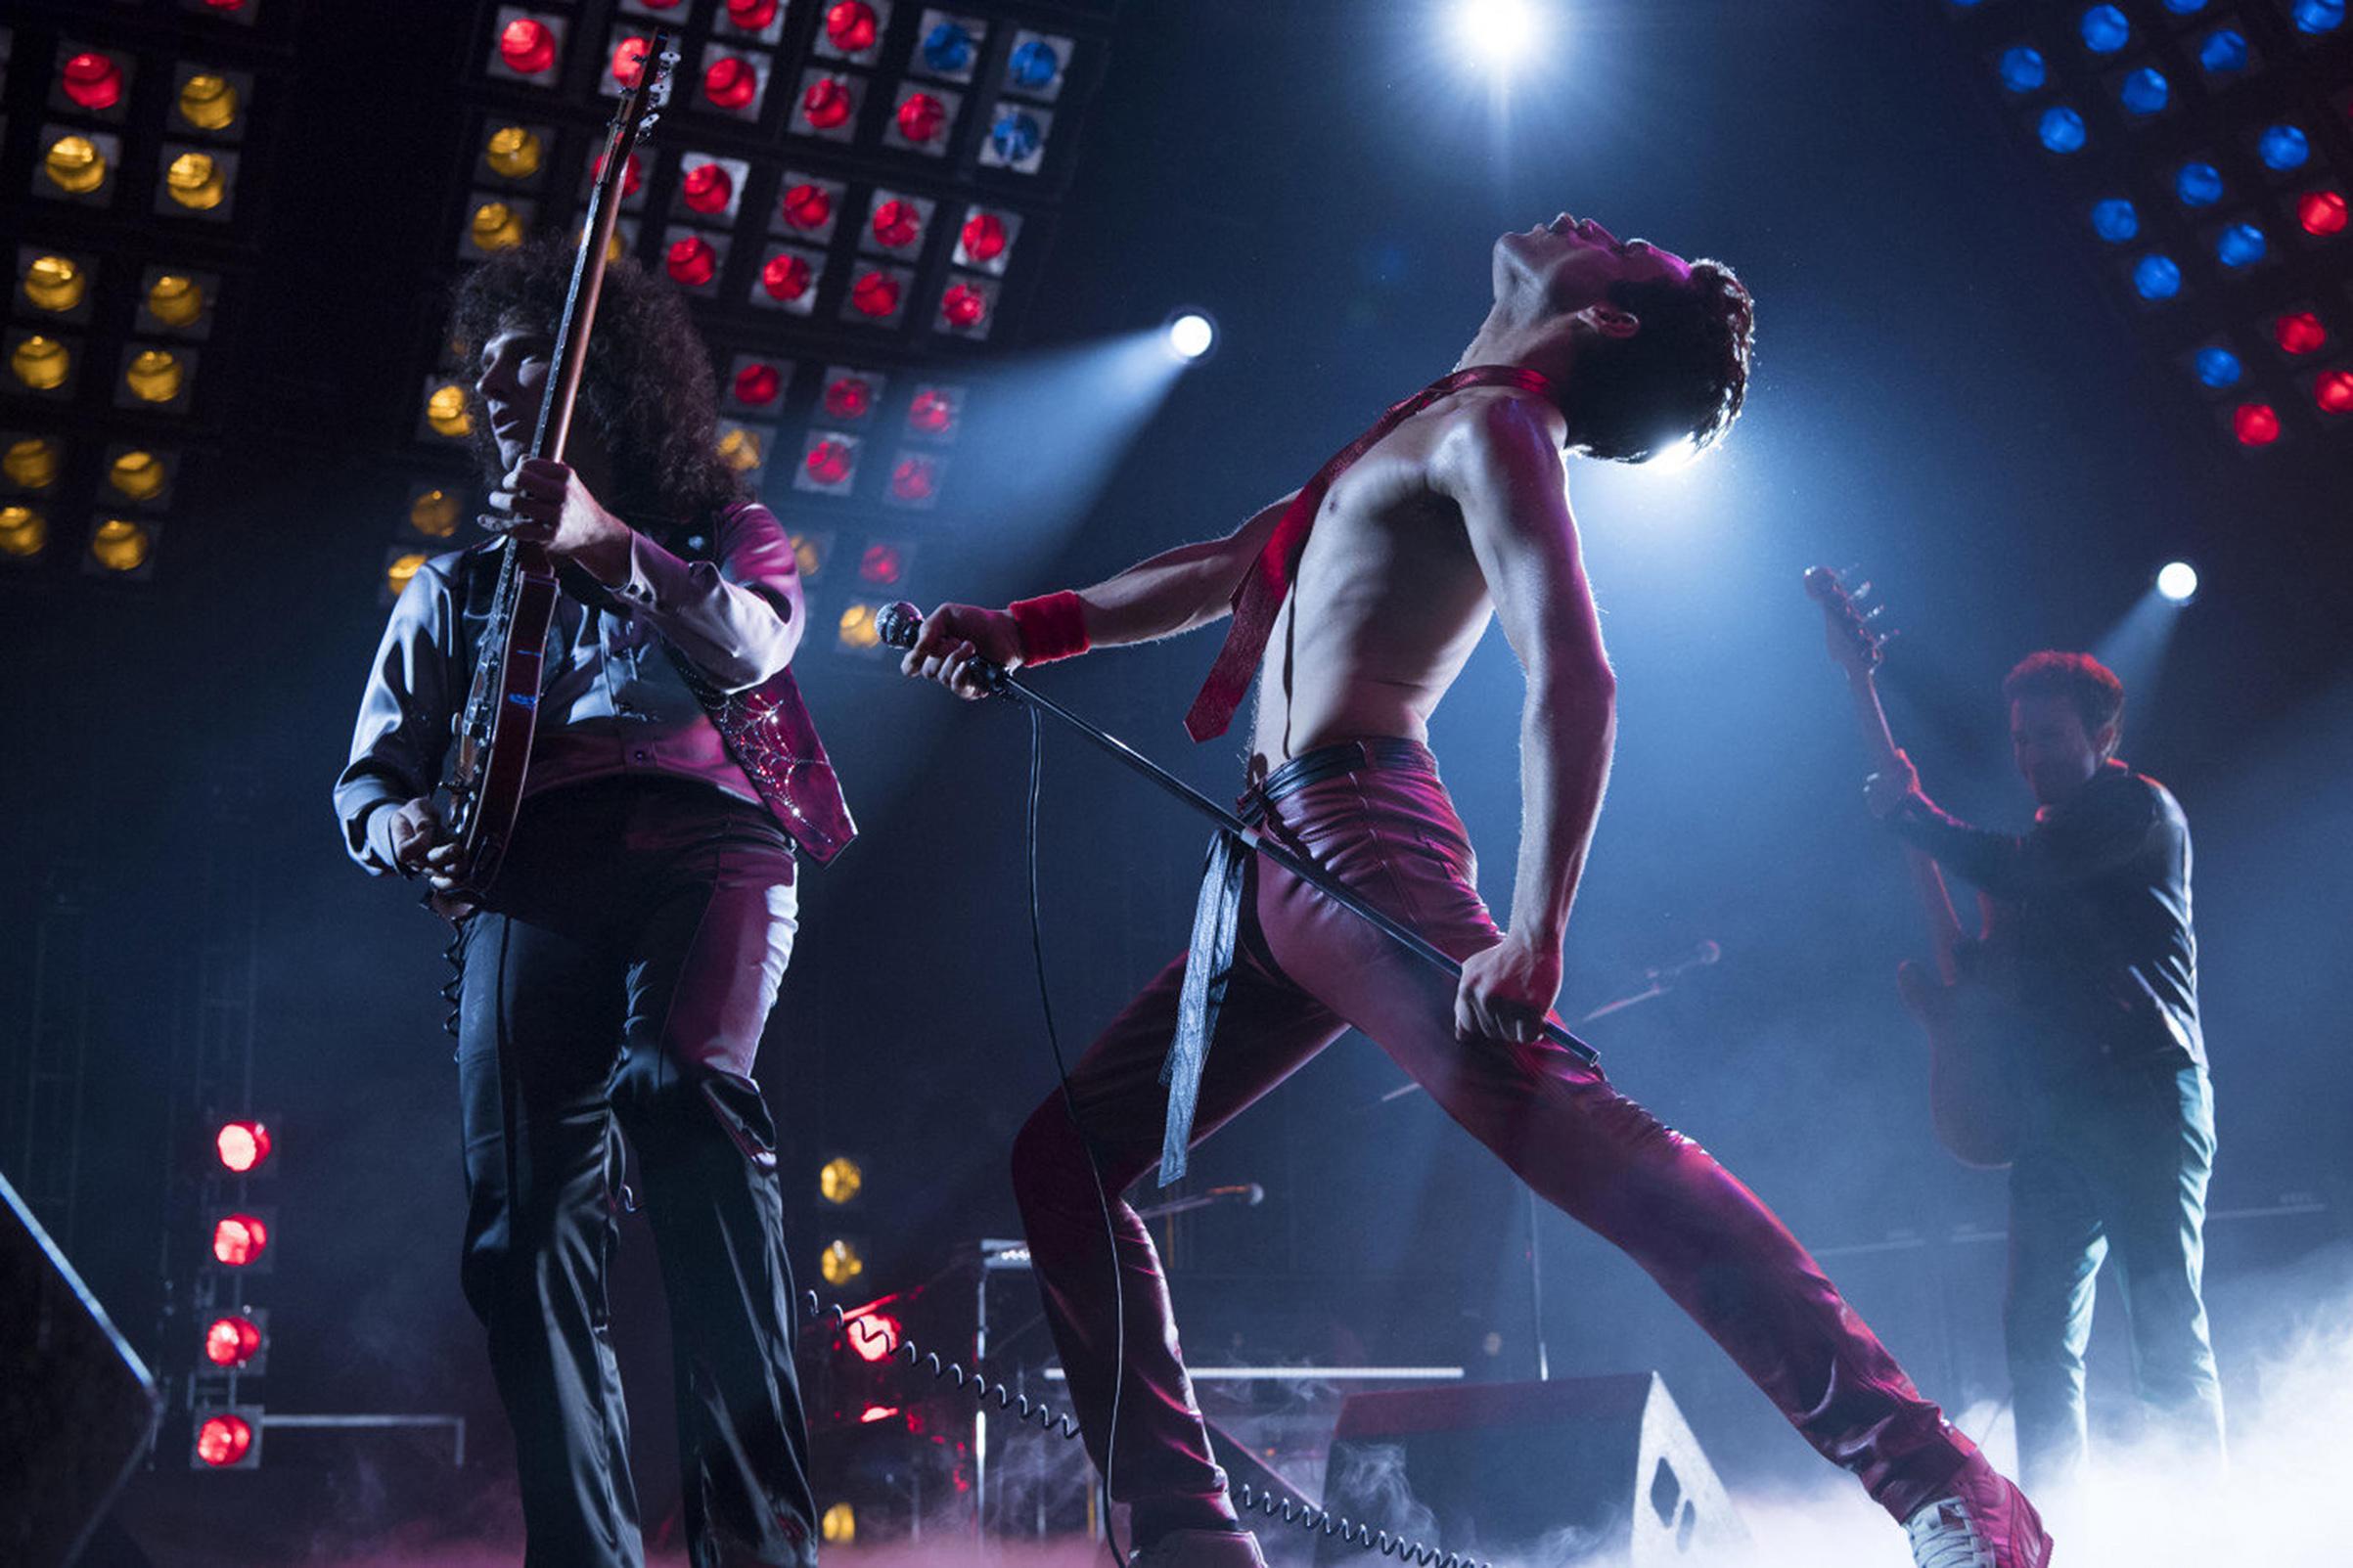 Gwilym Lee and Rami Malek are seen in the 'Bohemian Rhapsody' biopic.